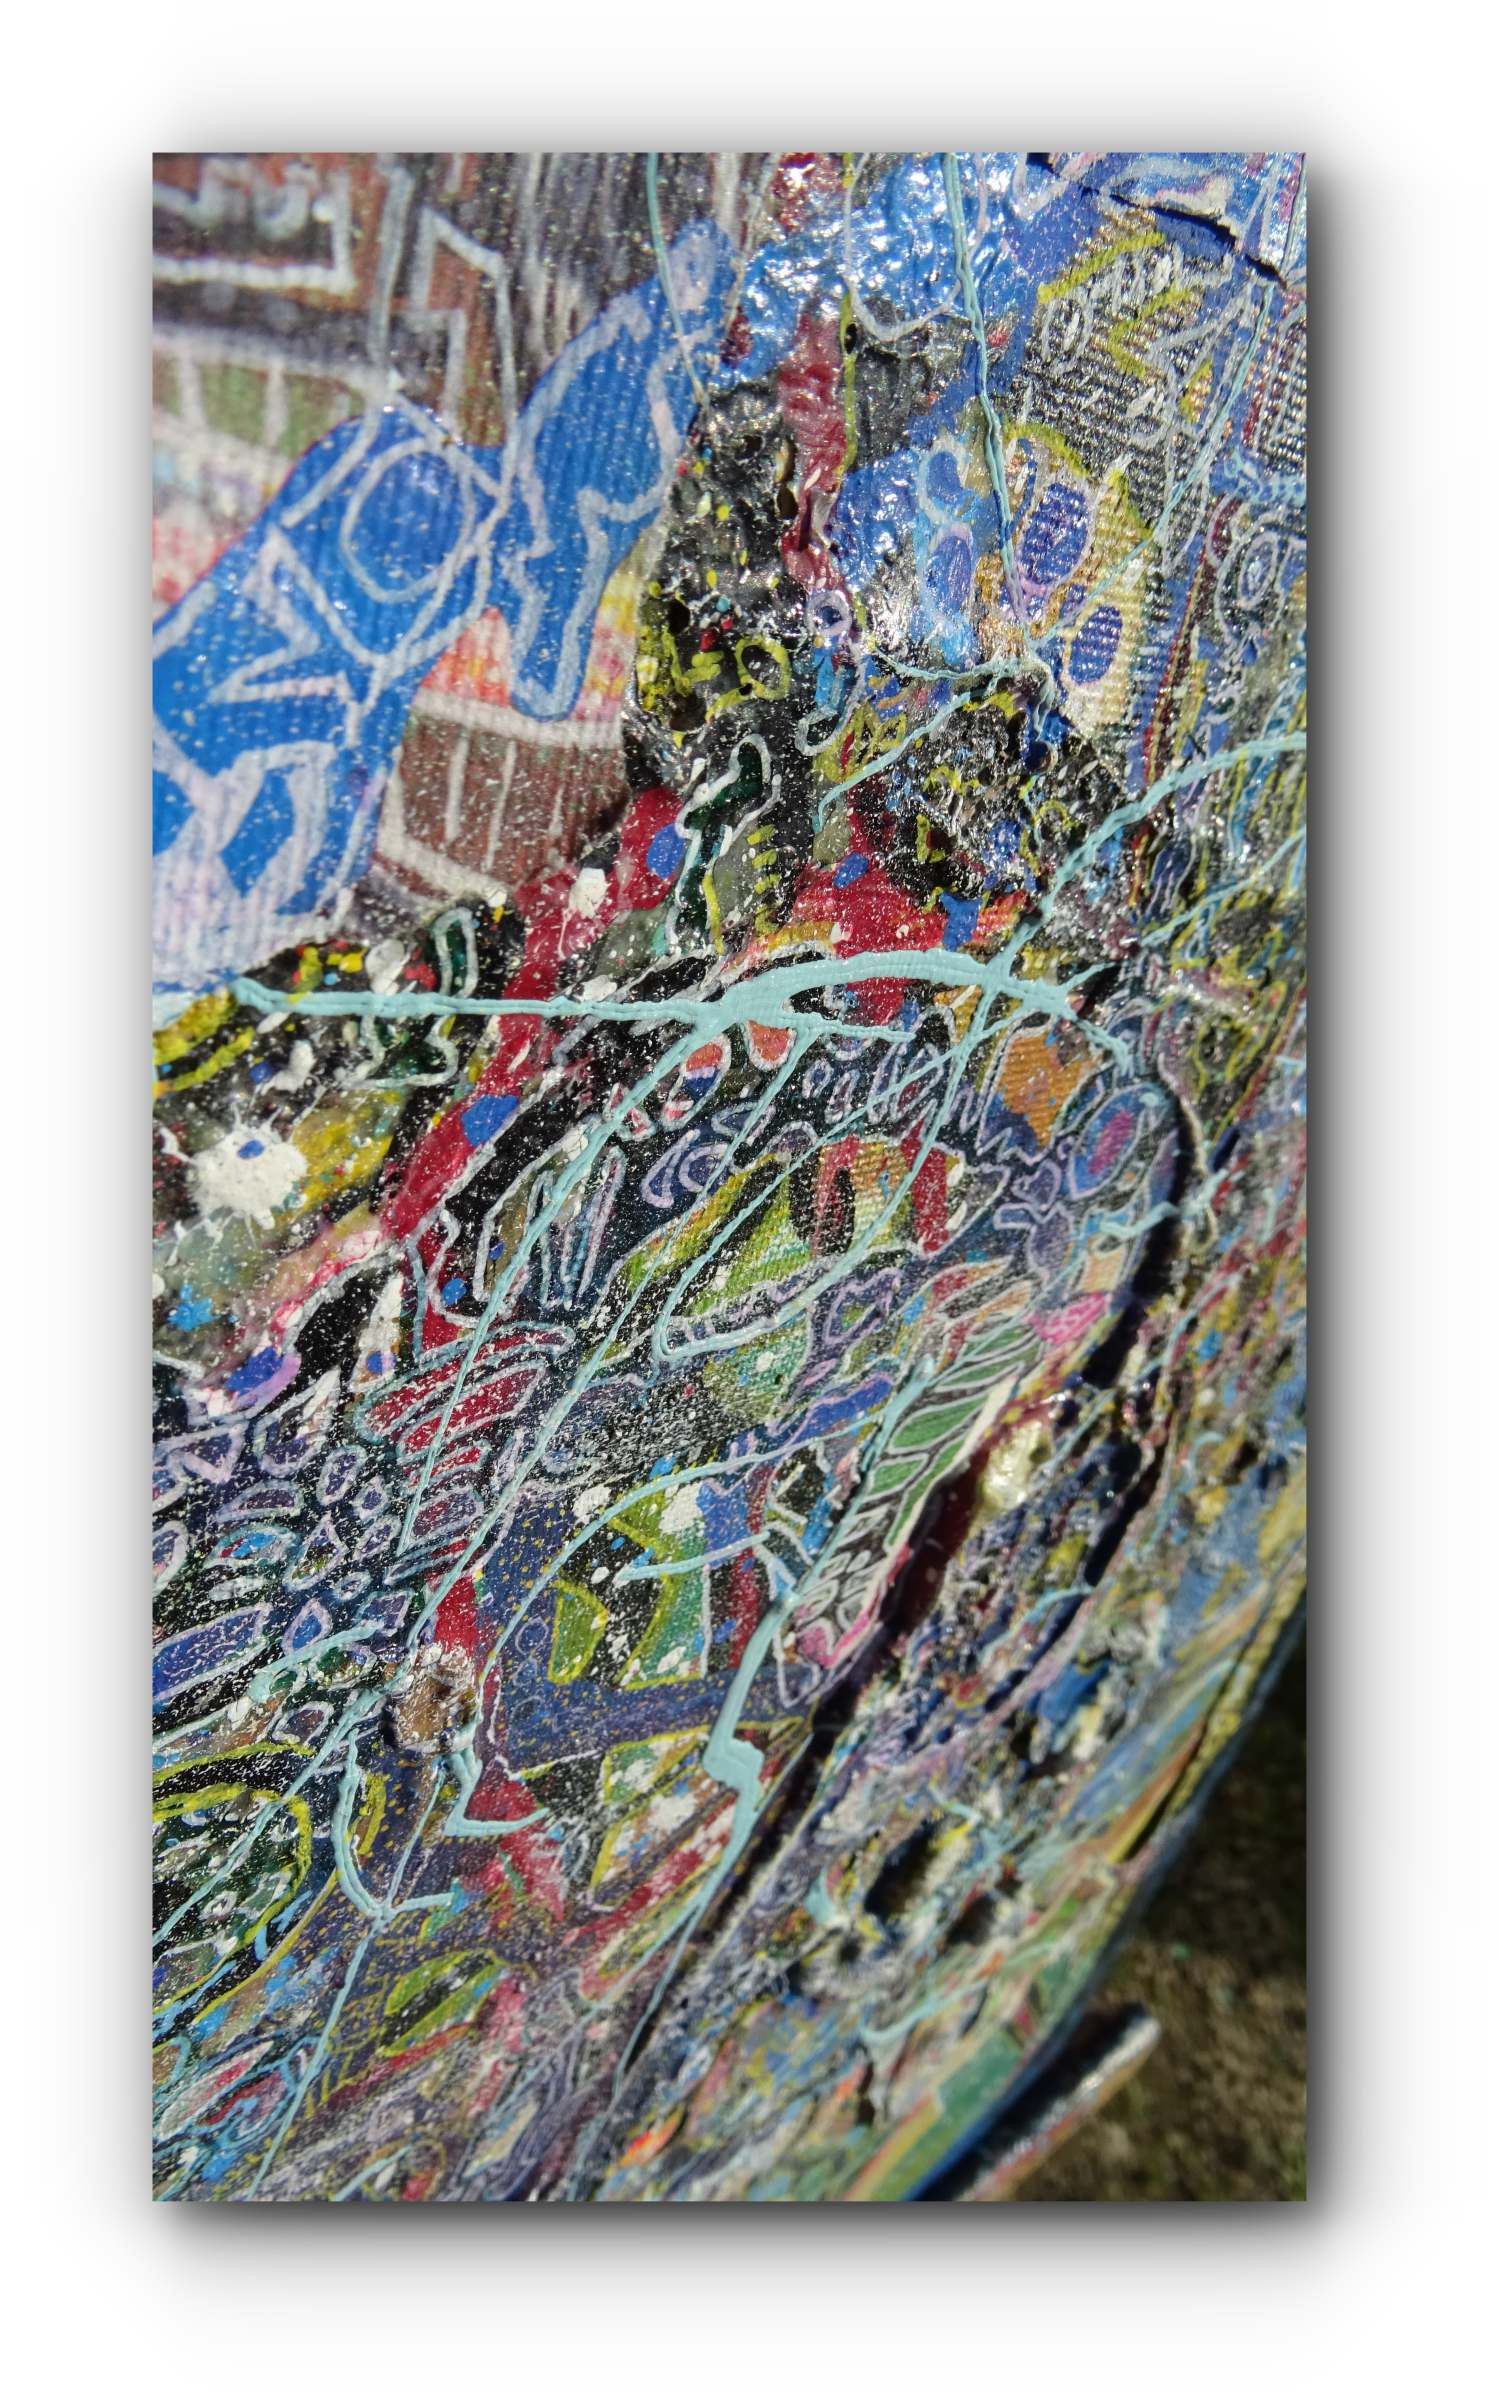 painting-detail-4-pillars-cosmos-artists-ingress-vortices.jpg